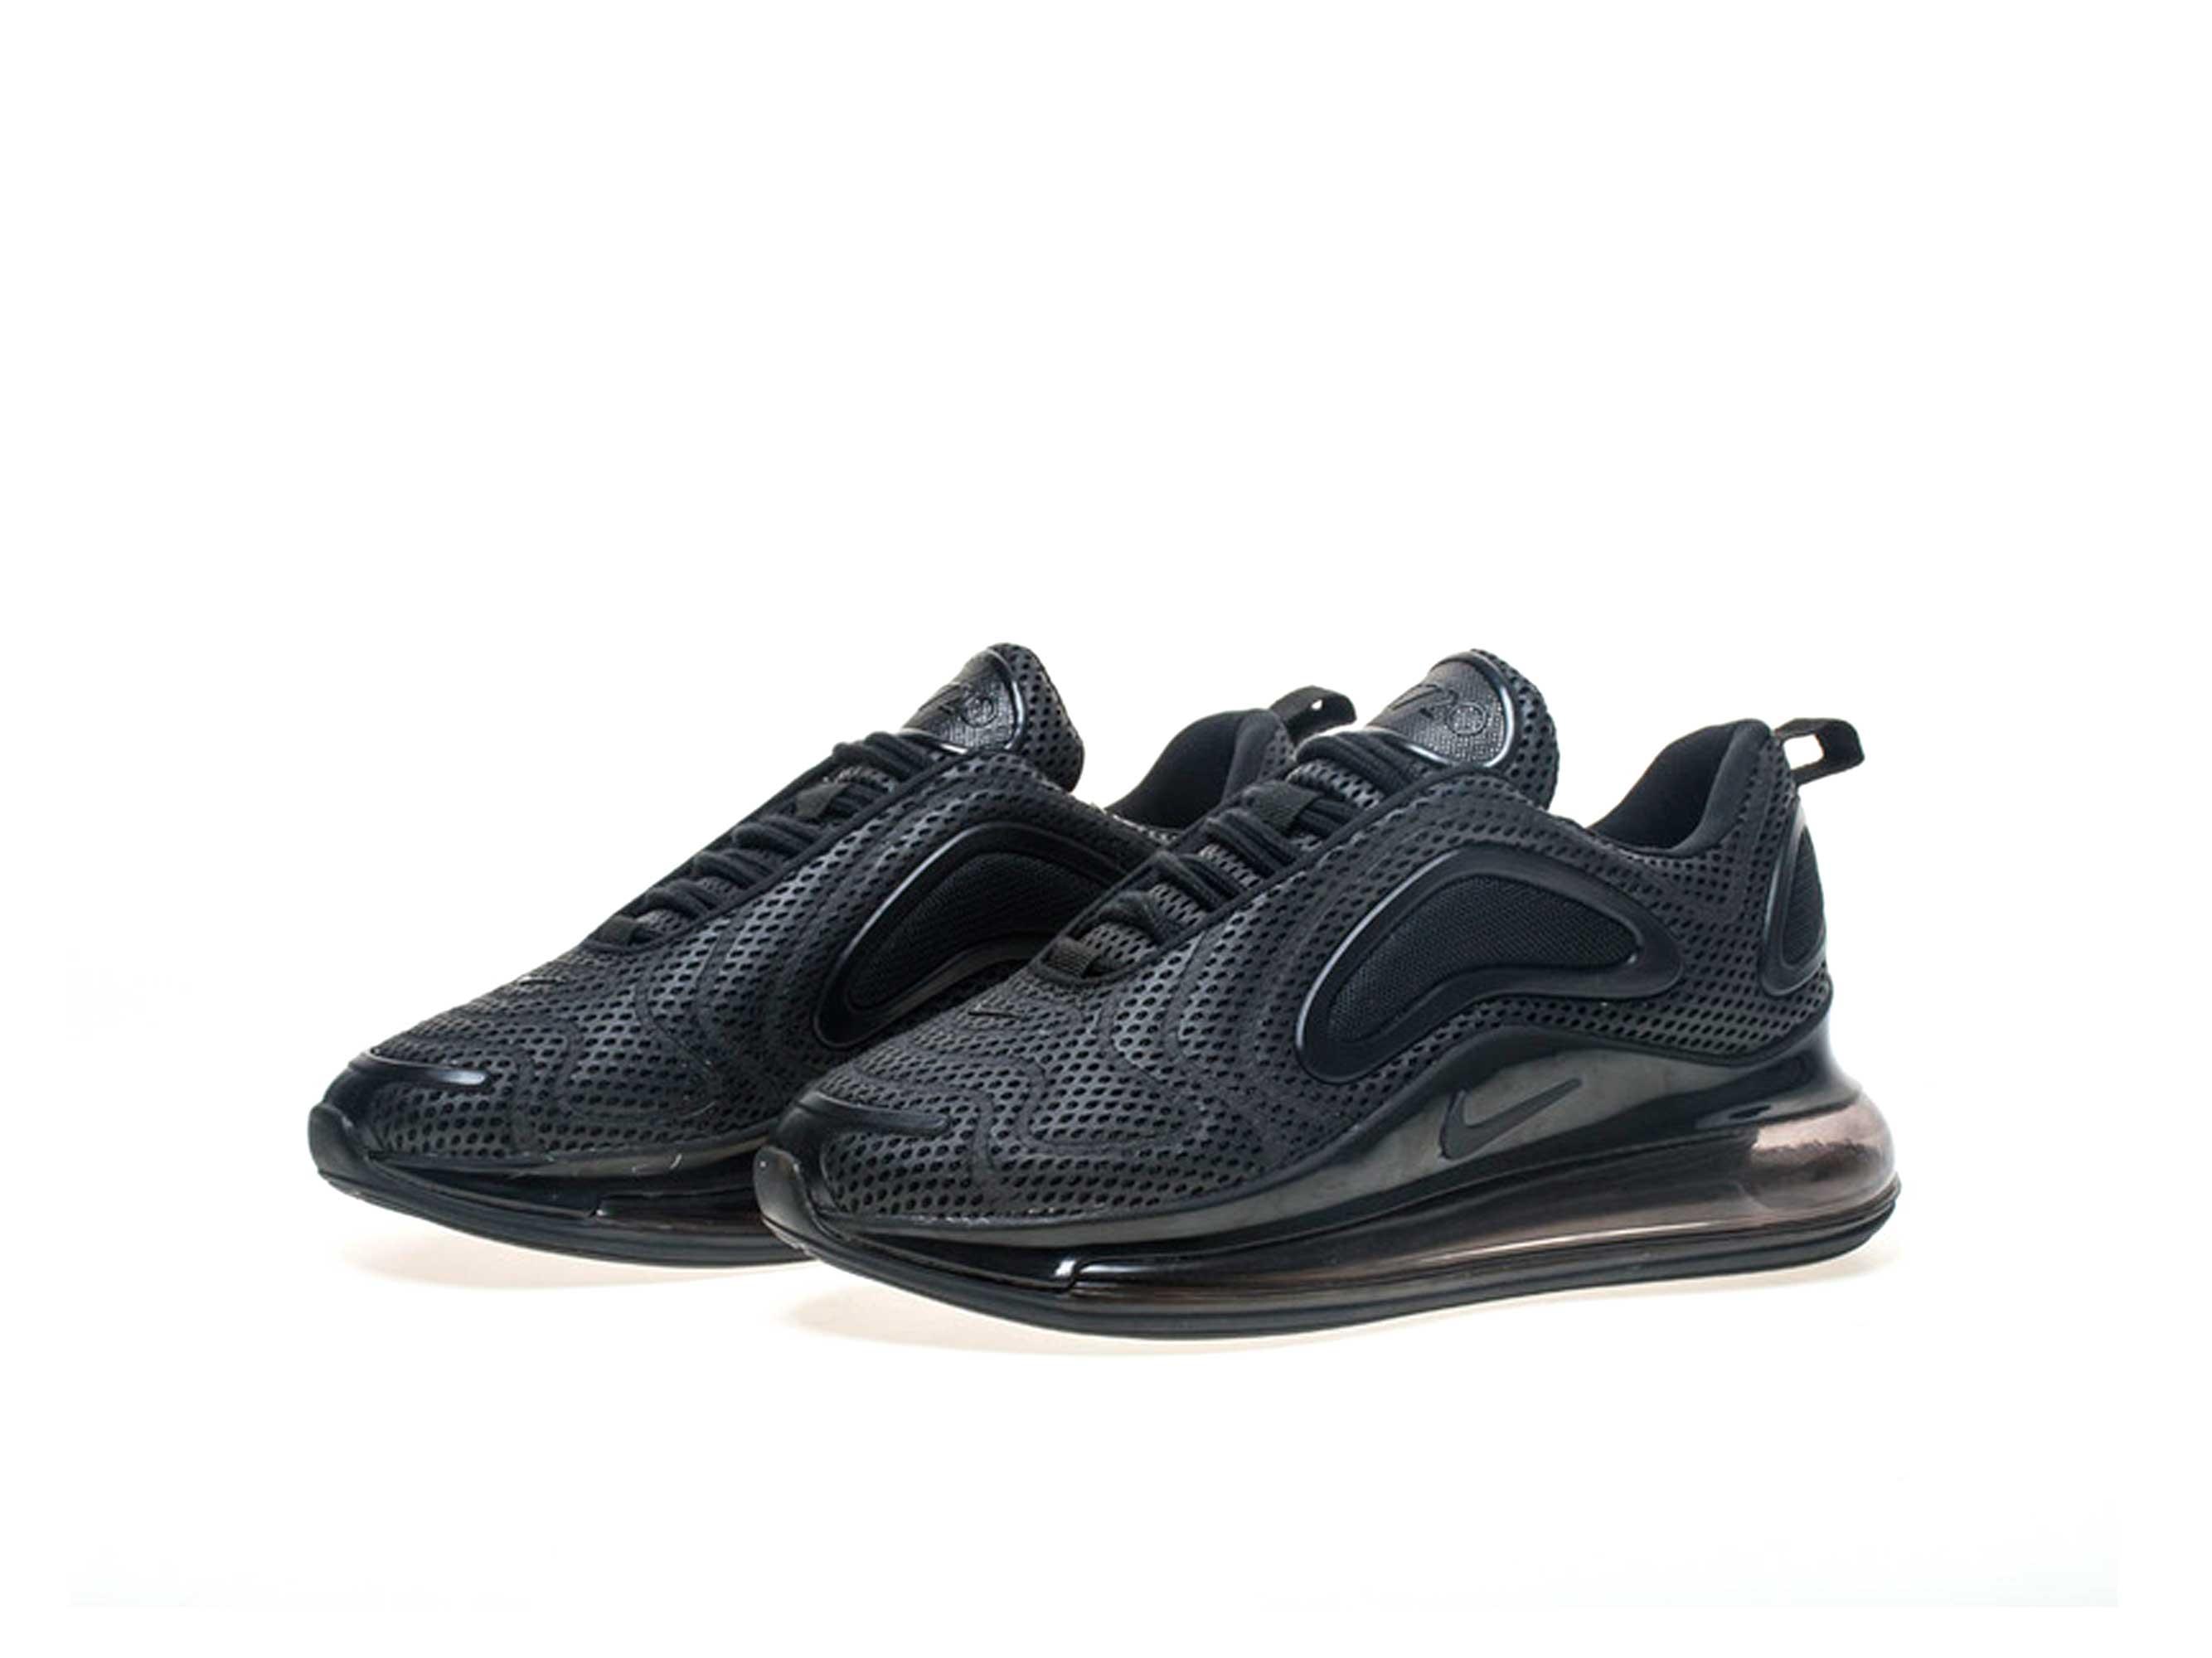 nike air max 720 all black ao2924_004 купить